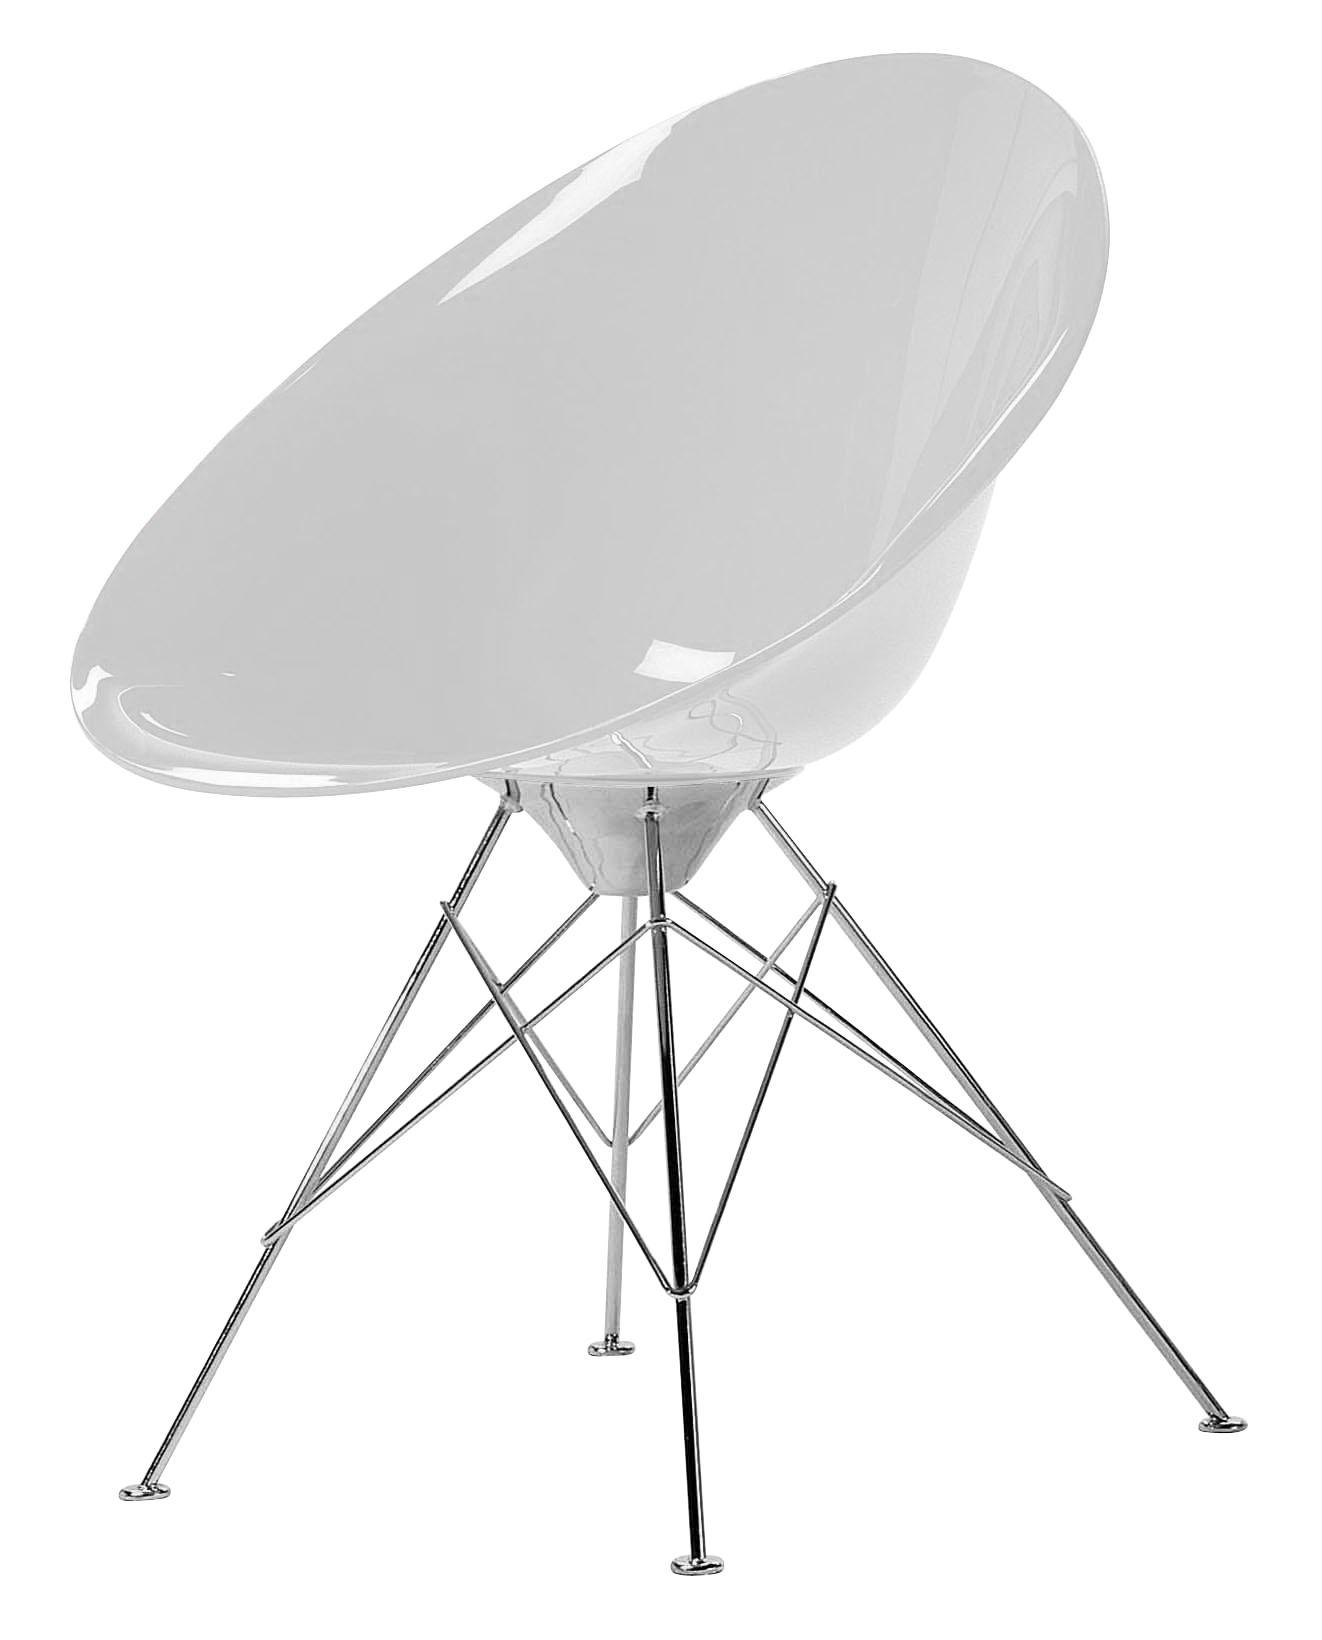 Arredamento - Sedie  - Poltrona Ero/S/ - Opaco - 4 piedi di Kartell - Opaco bianco - Acciaio cromato, policarbonato